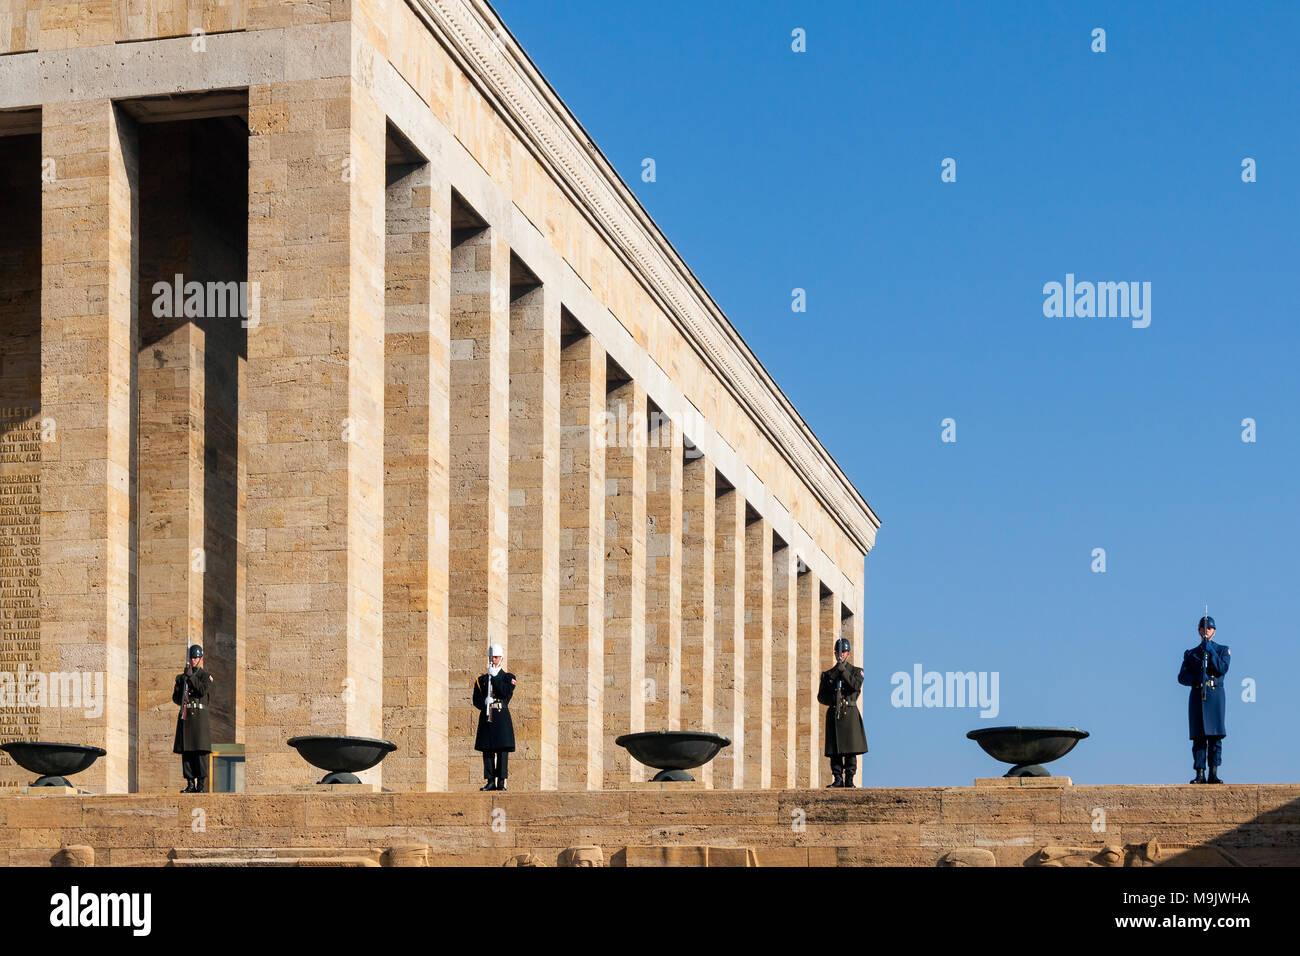 Ataturk Mausoleum in Ankara, Turkey. Tthe Anitkabir, tomb of Mustafa Kemal Ataturk and the guardsmen Stock Photo